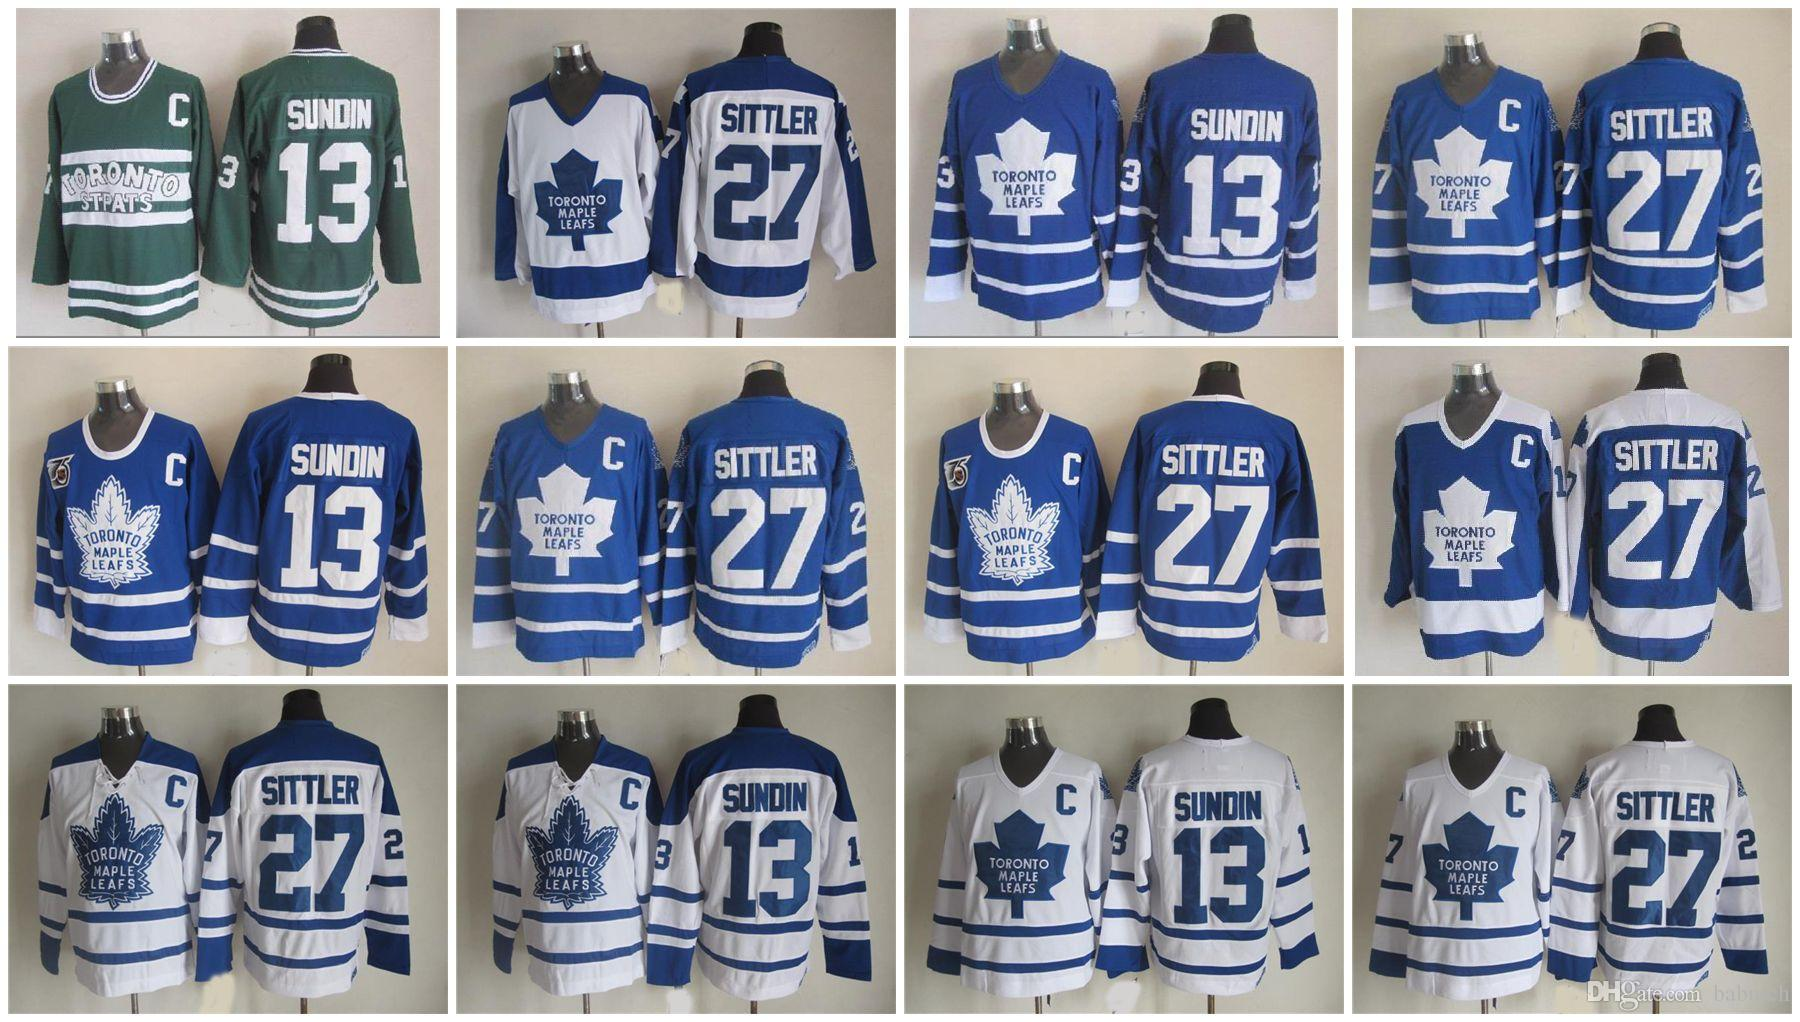 Retro Toronto Maple Leafs Darryl Sittler 75th Anniversary Hockey Jerseys  Vintage Classic 27 Darryl Sittler Jerseys Embroidery C Patch Toronto Maple  Leafs ... d75b499bd